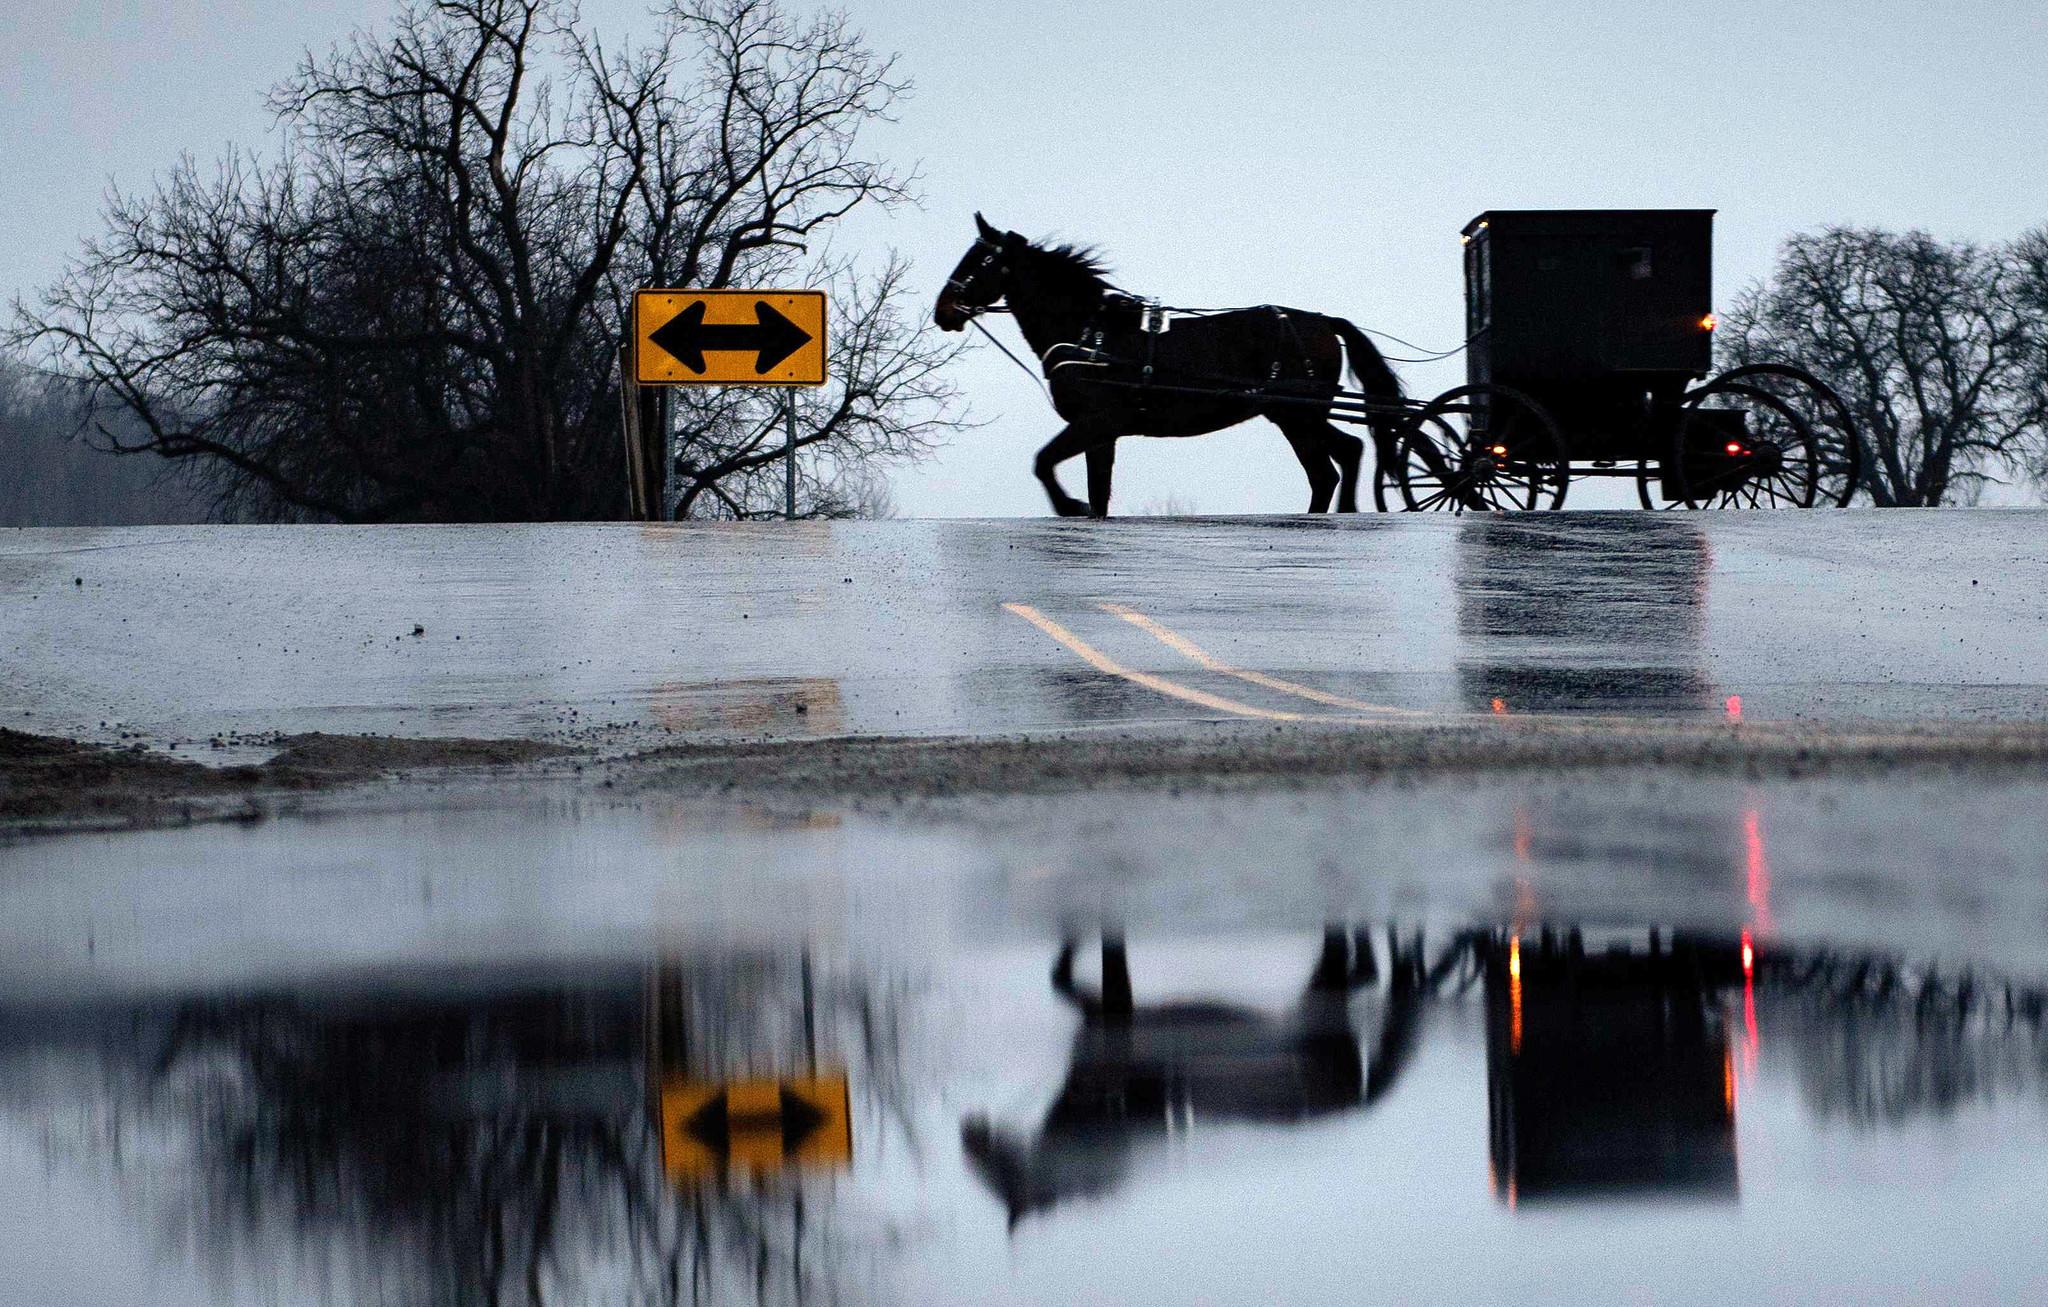 $60M Ponzi scheme targeted Amish and Mennonites: feds